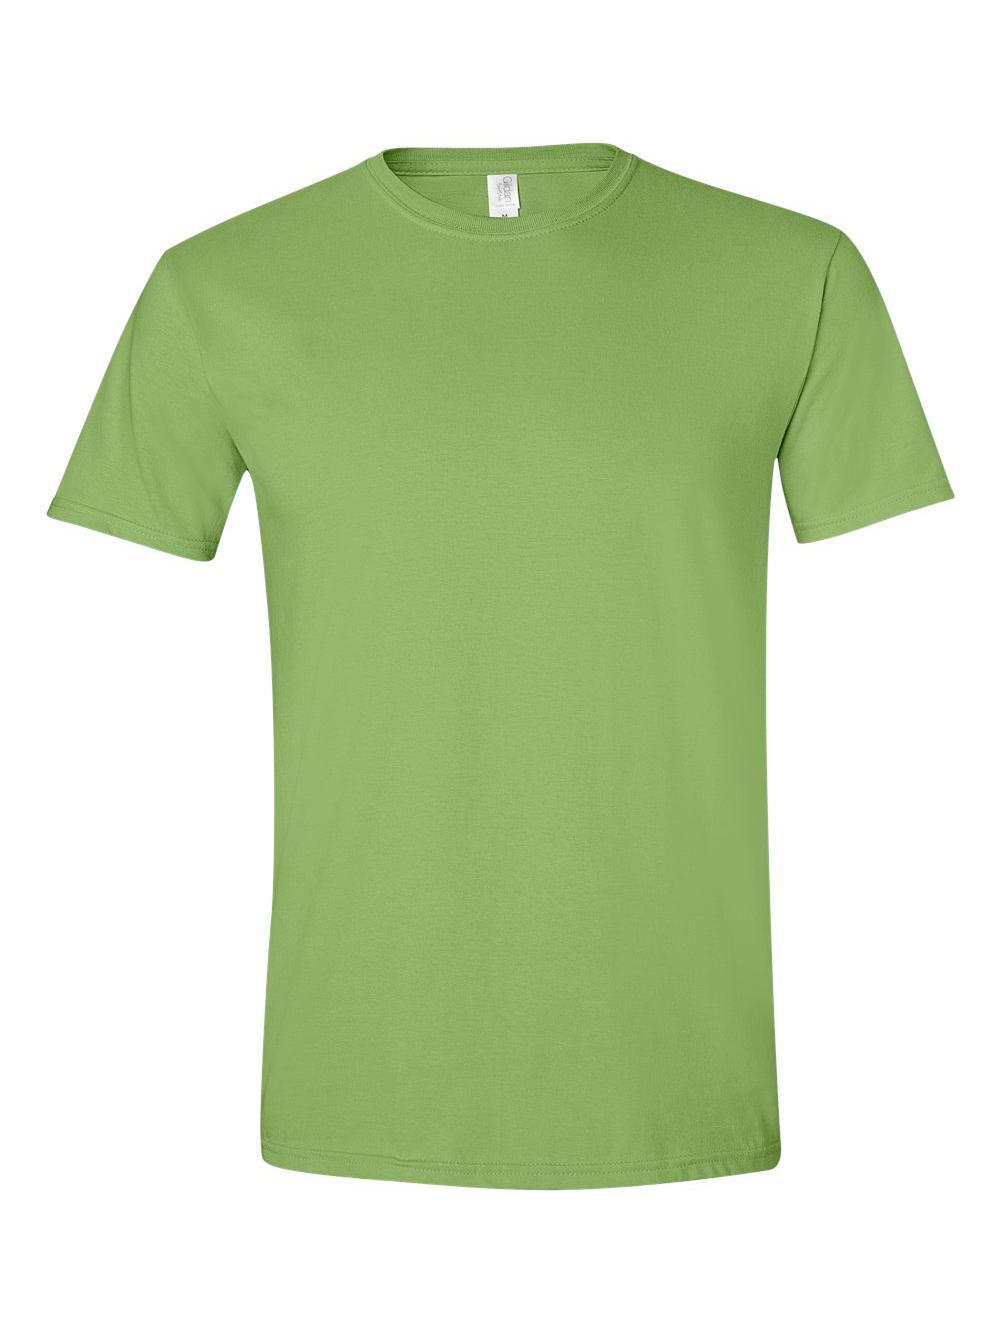 Gildan-Softstyle-T-Shirt-64000 thumbnail 117